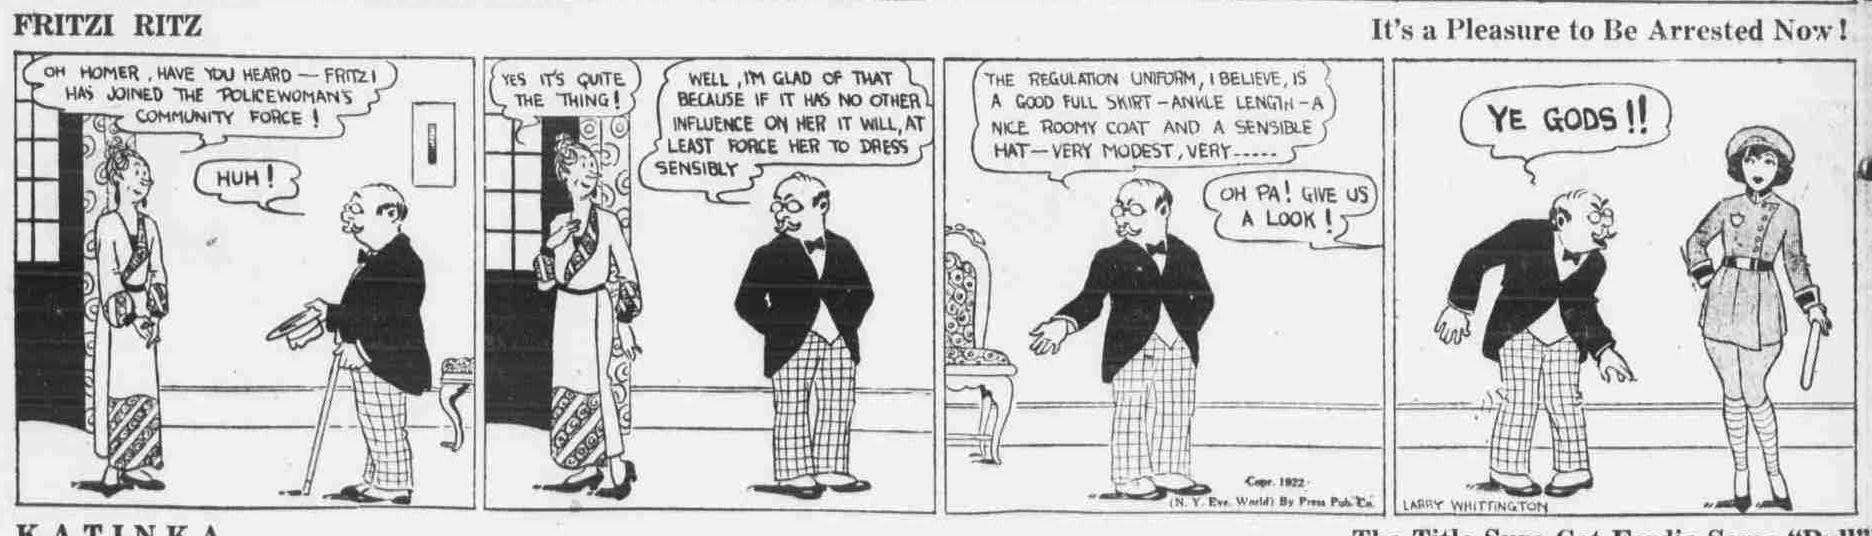 Nov. 6, 1922